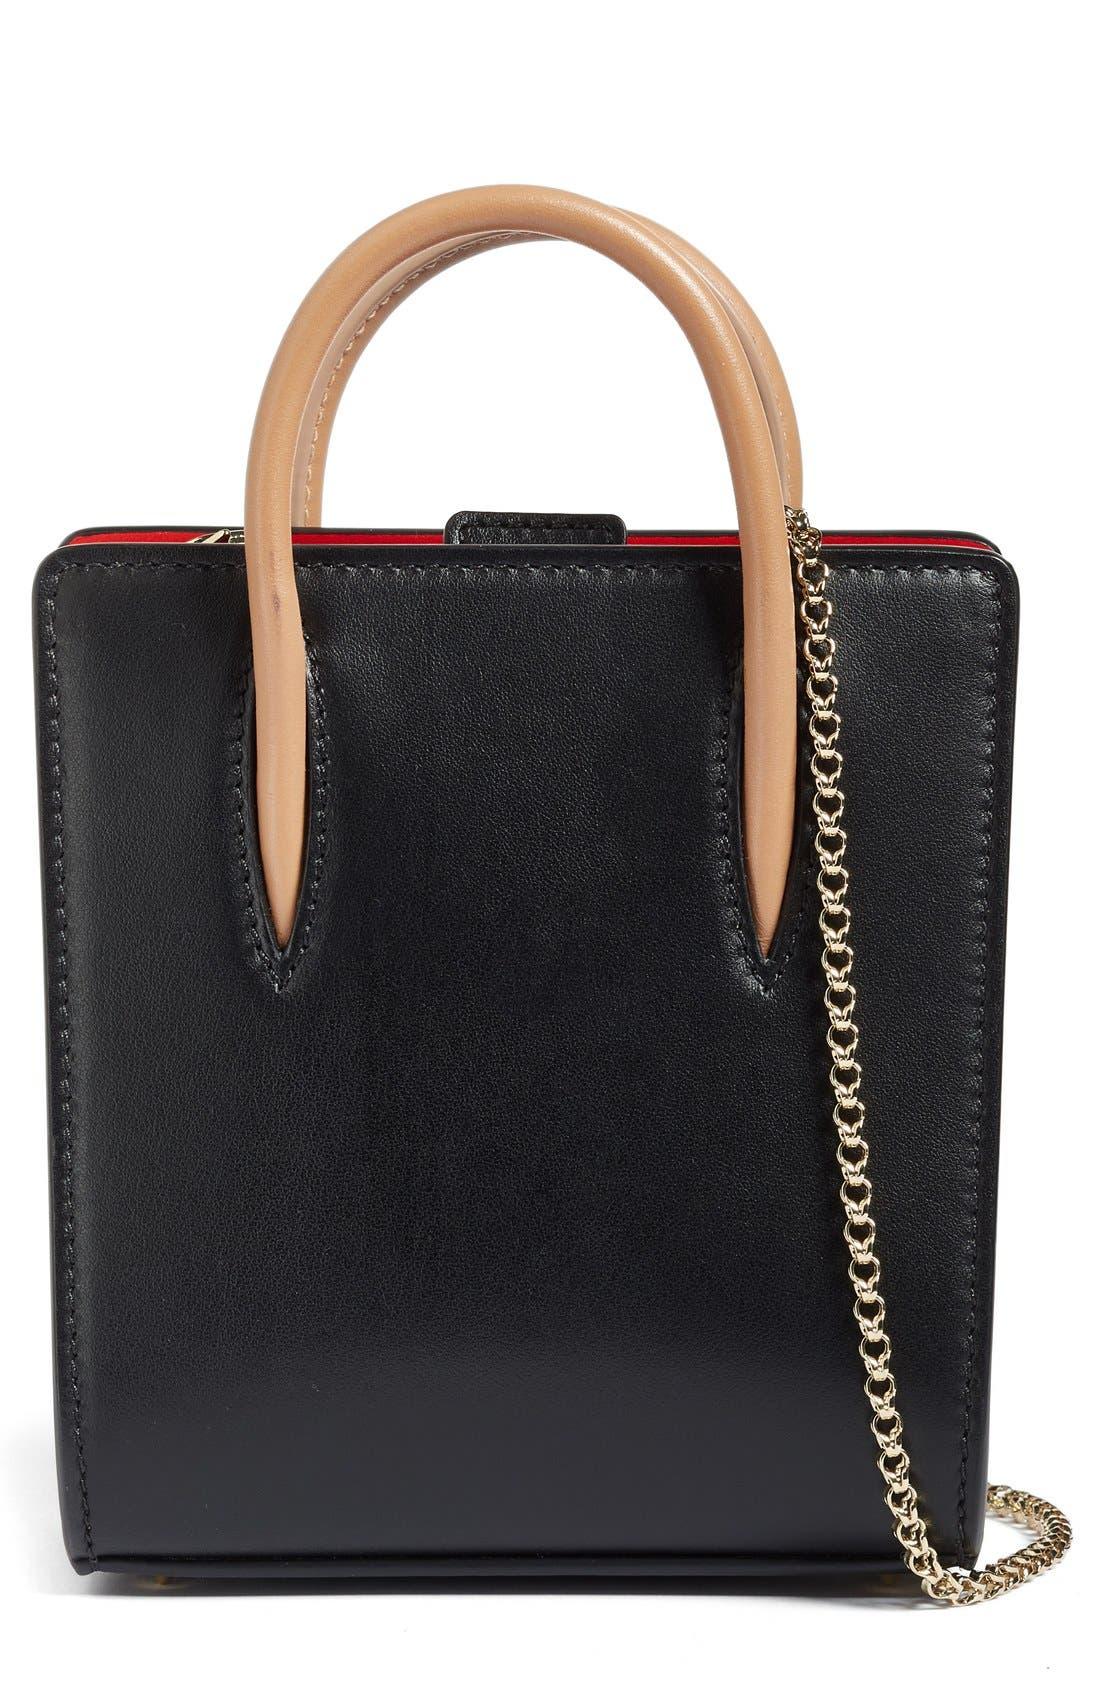 Nano Paloma Calfskin Leather Tote,                         Main,                         color, Black/Brown